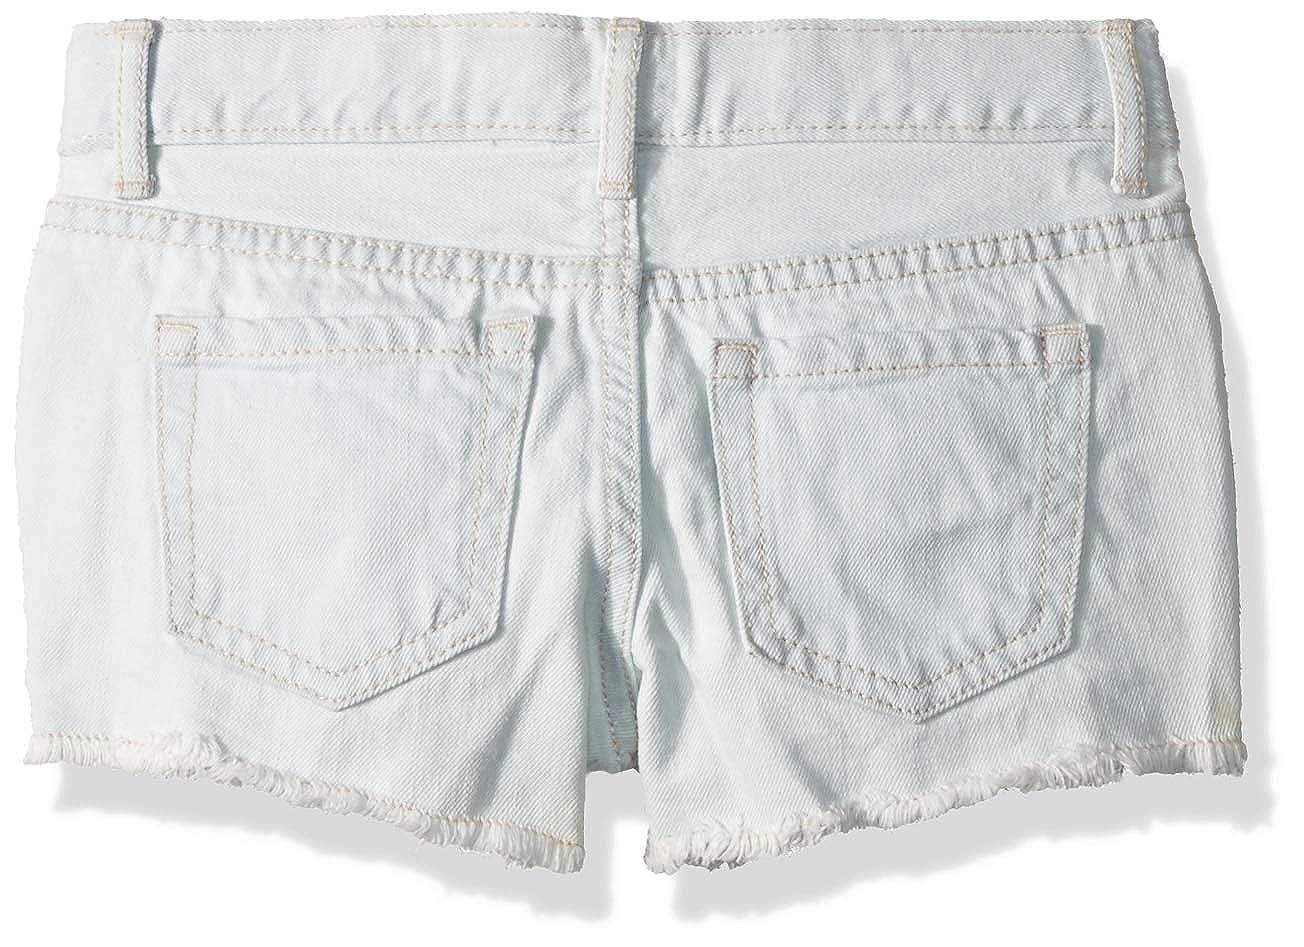 The Childrens Place Big Girls Plus Sized Denim Shorts